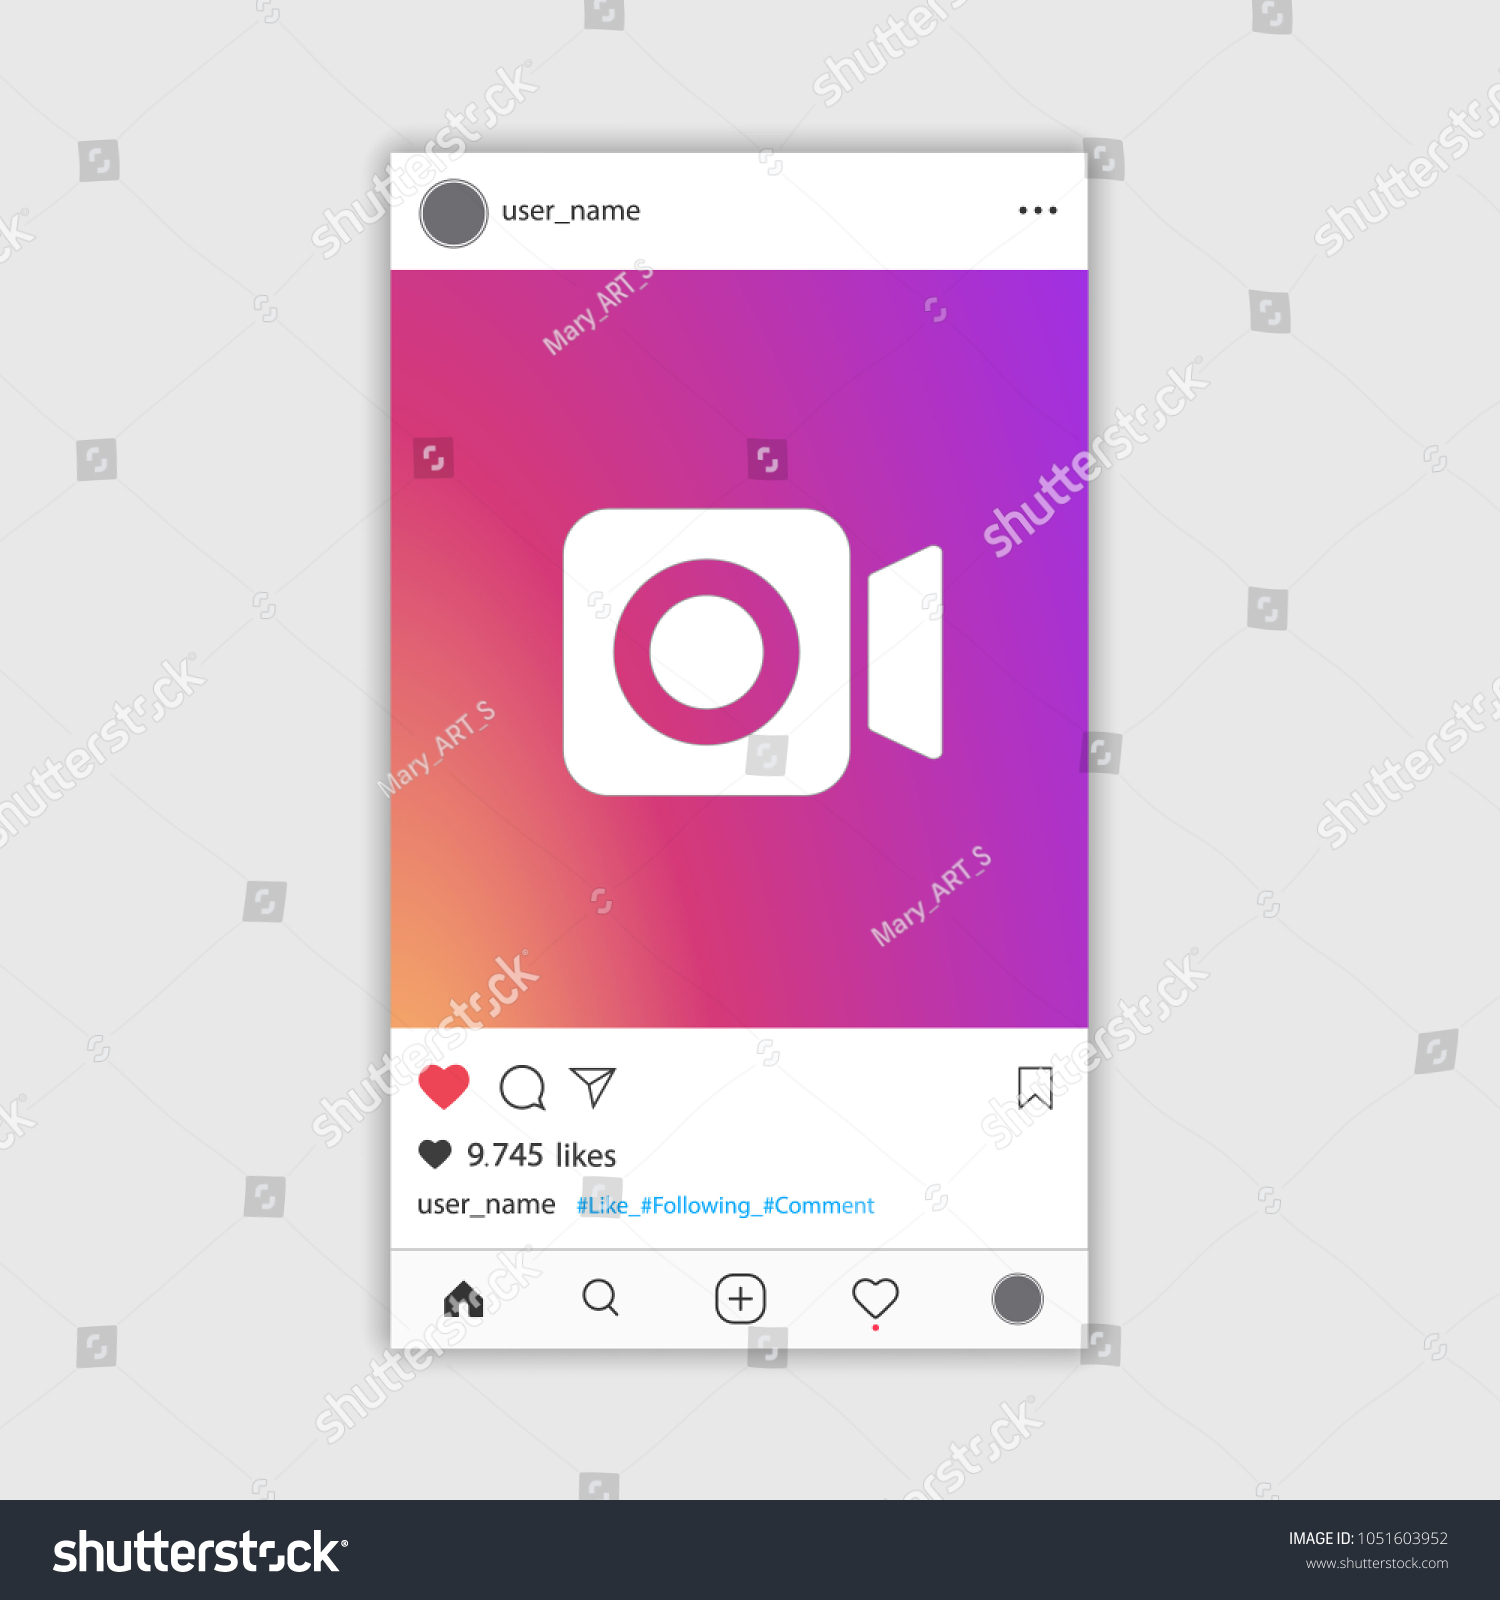 Social Media Instagram Video Frame Gradient Stock Vector 1051603952 ...